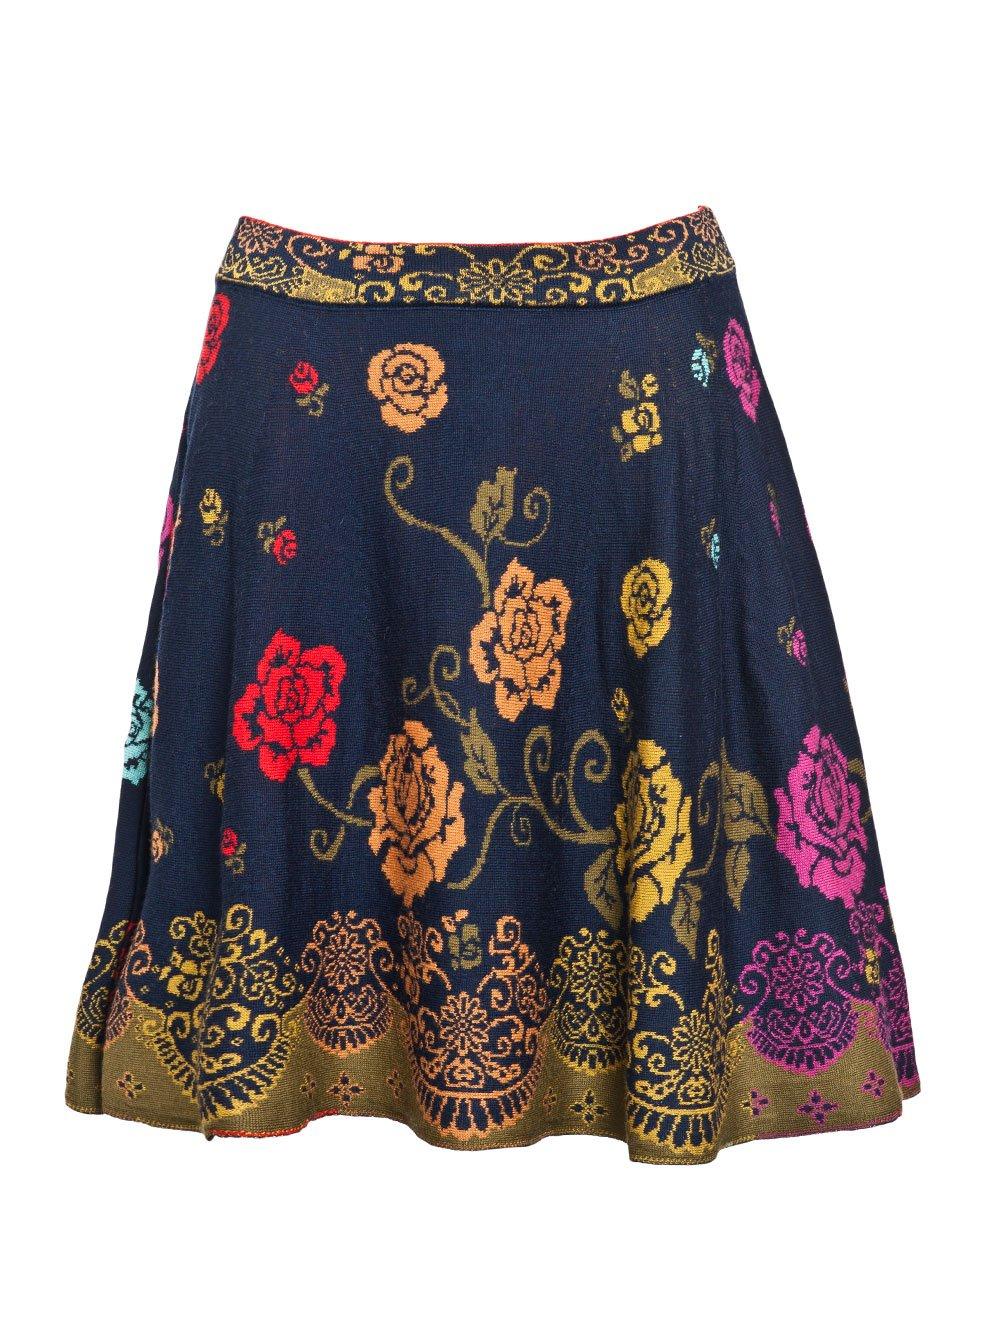 IVKO Skirt, Foral Pattern Marine EUR 42 - US 12